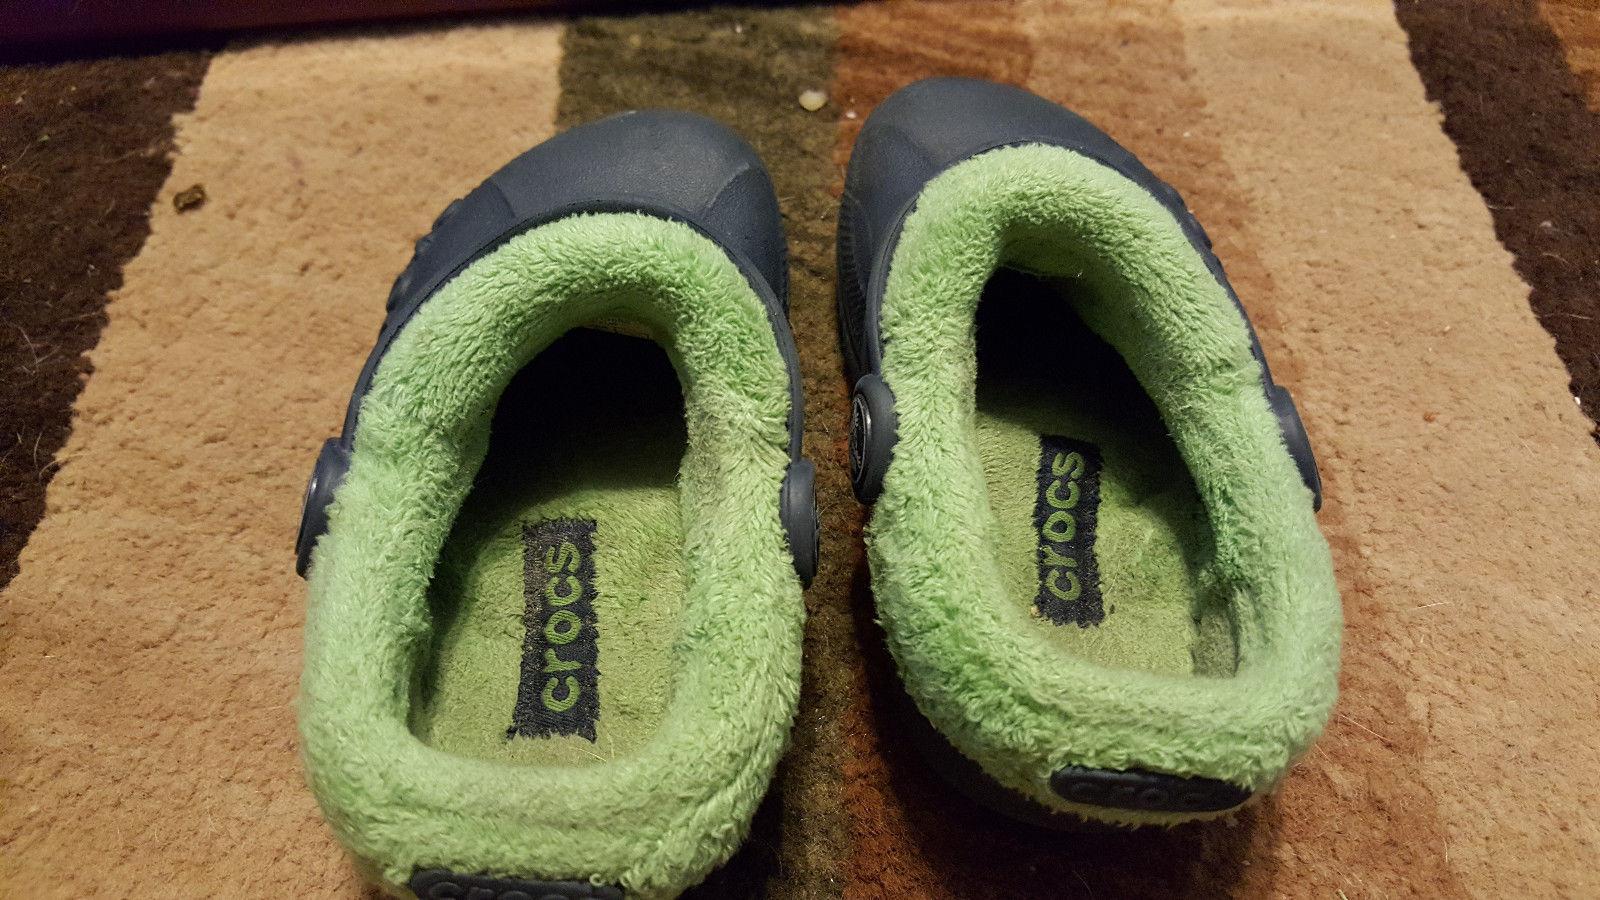 blue crocs toddler boys girls 6/7 insulated